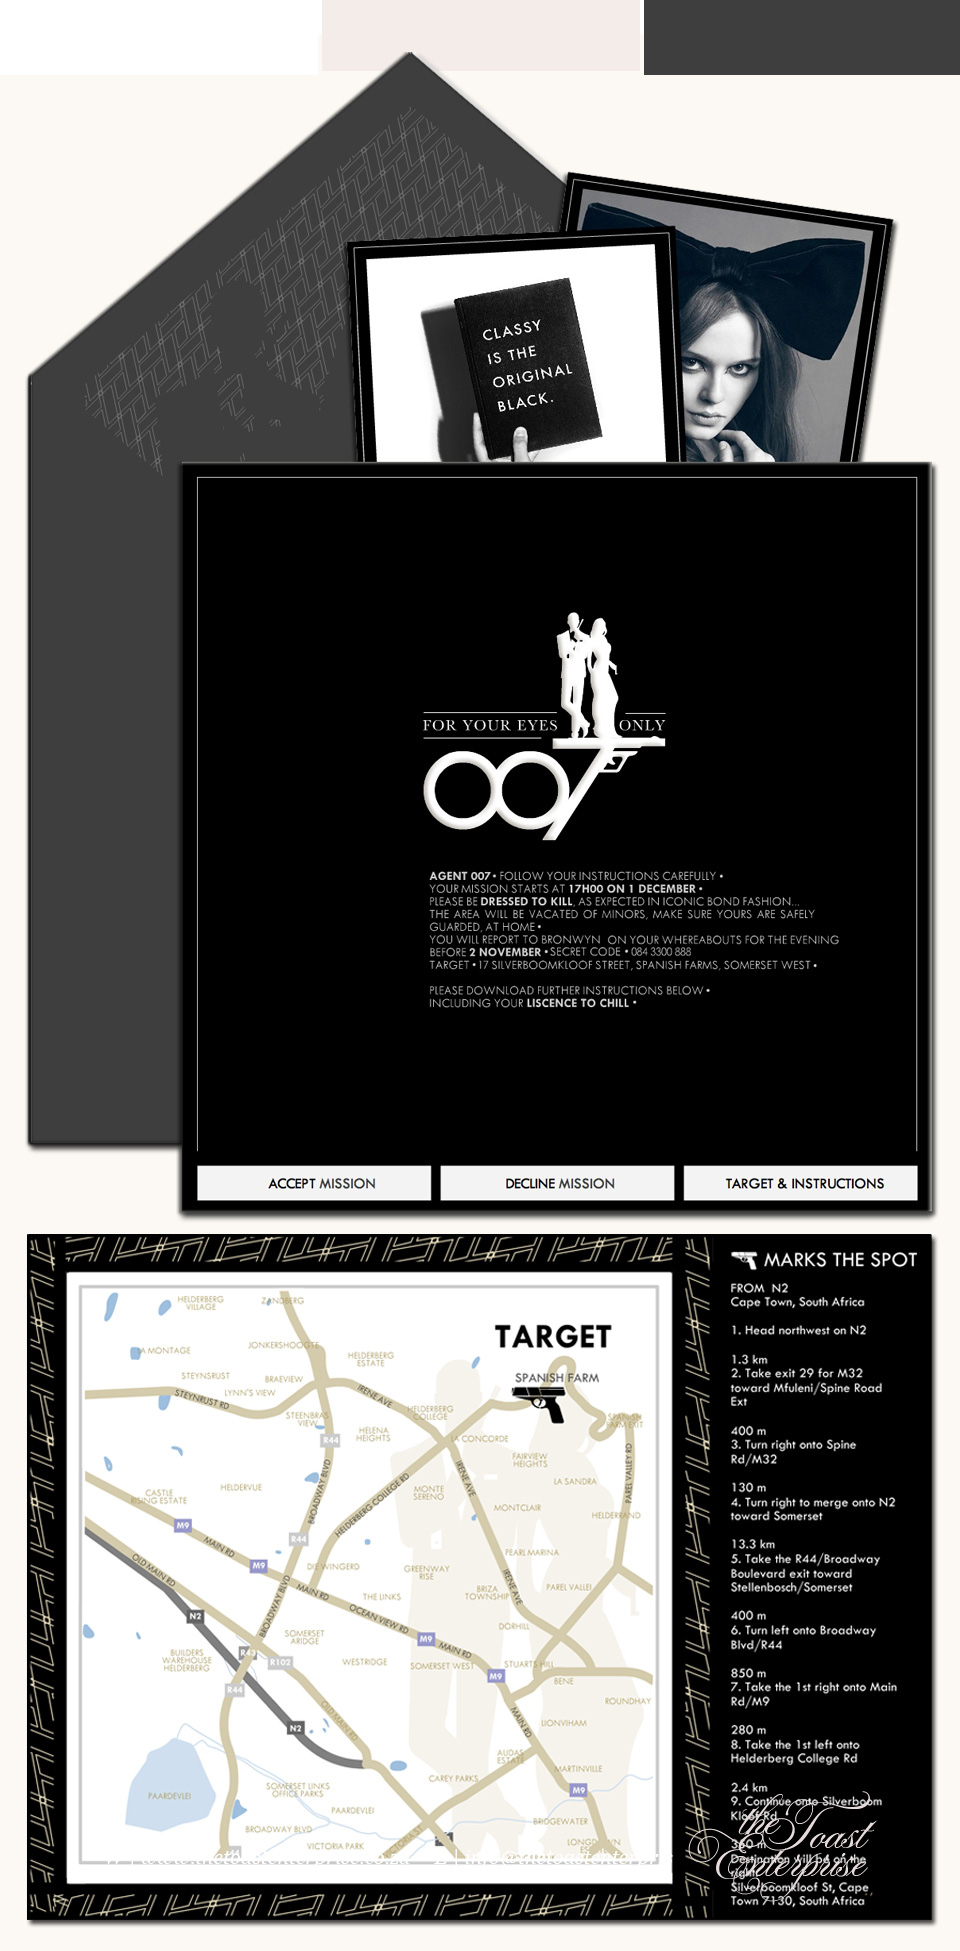 17+ Images About James Bond Wedding Invitations On Pinterest